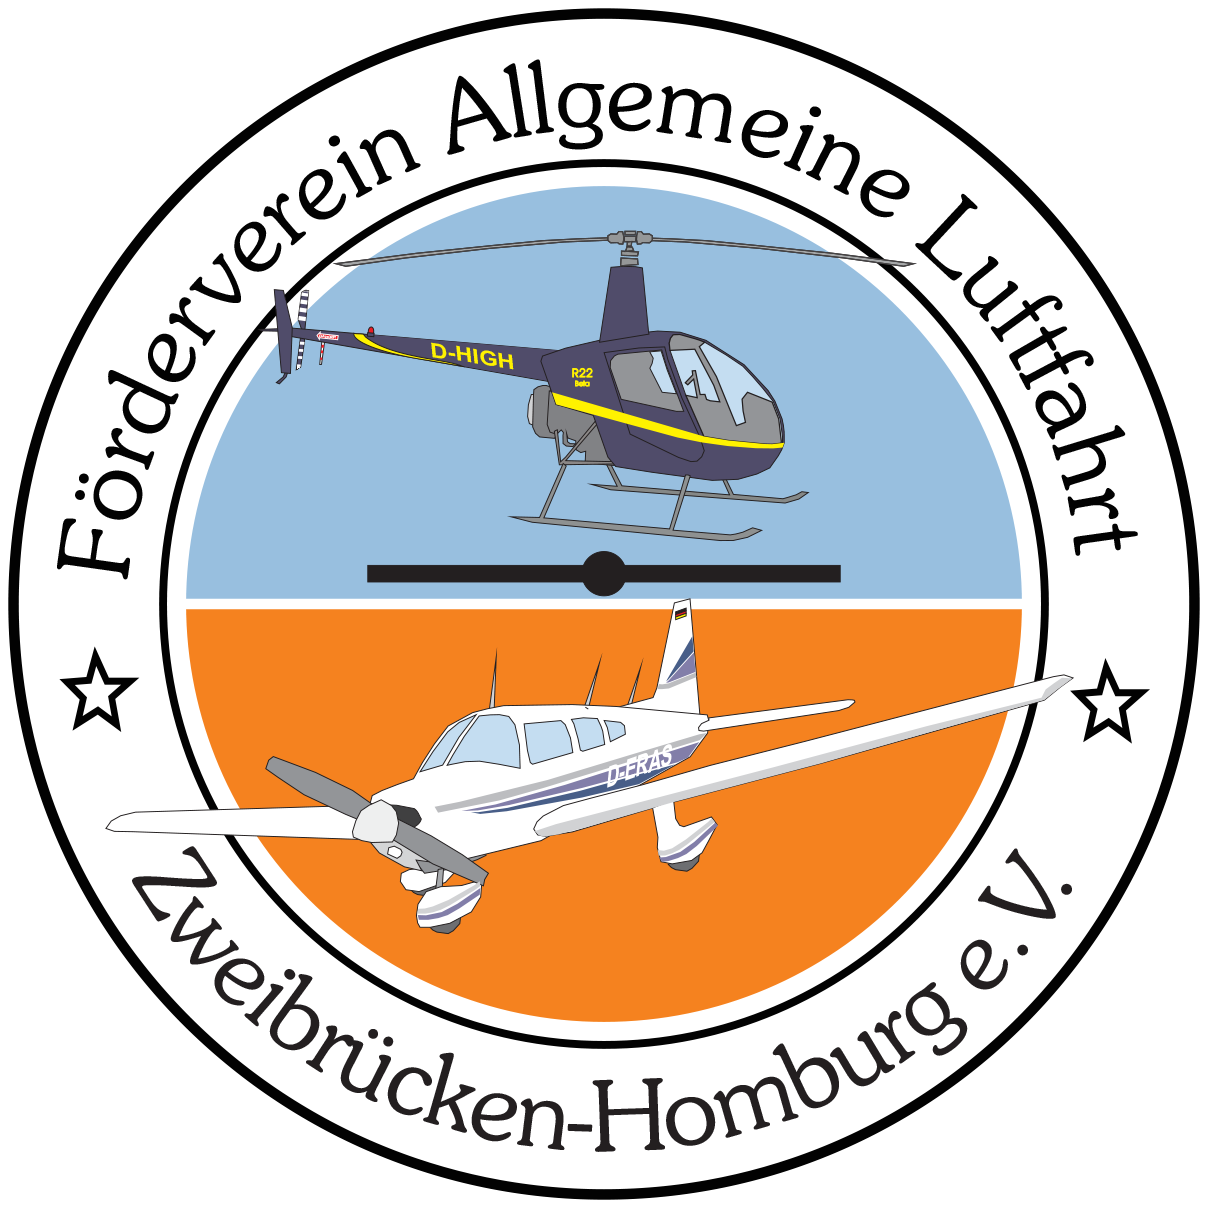 Förderverein Allgemeine Luftfahrt (FAL) Homburg-Zweibrücken e. V.